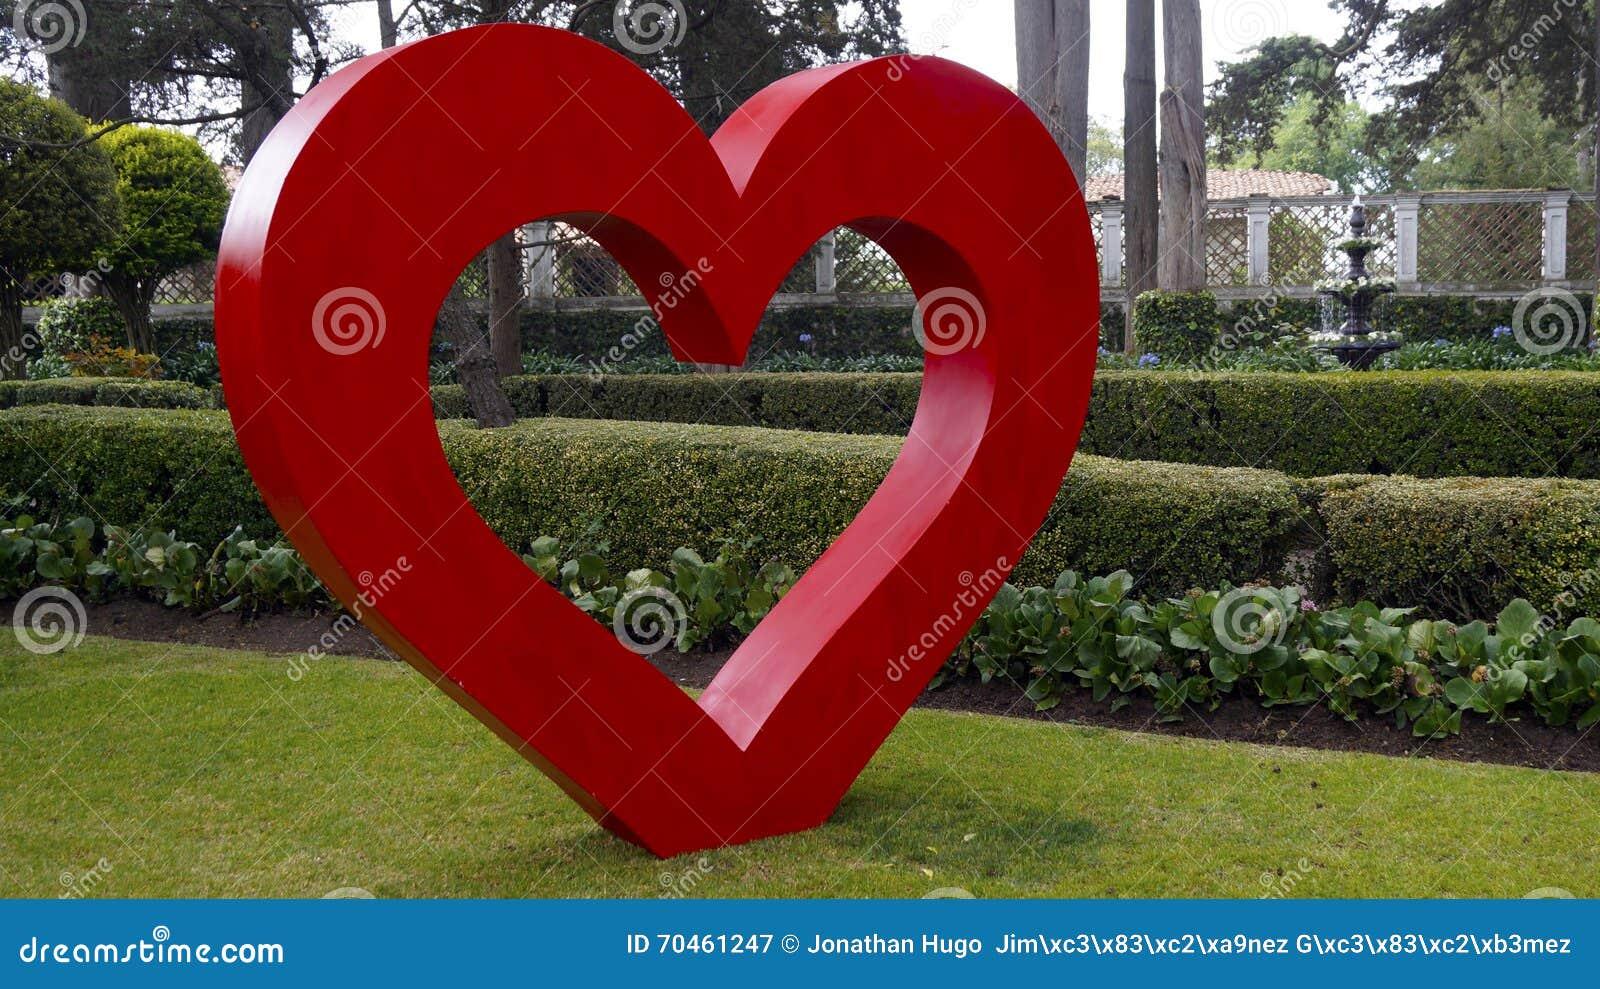 big heart garden decoration stock photo - image: 70461247